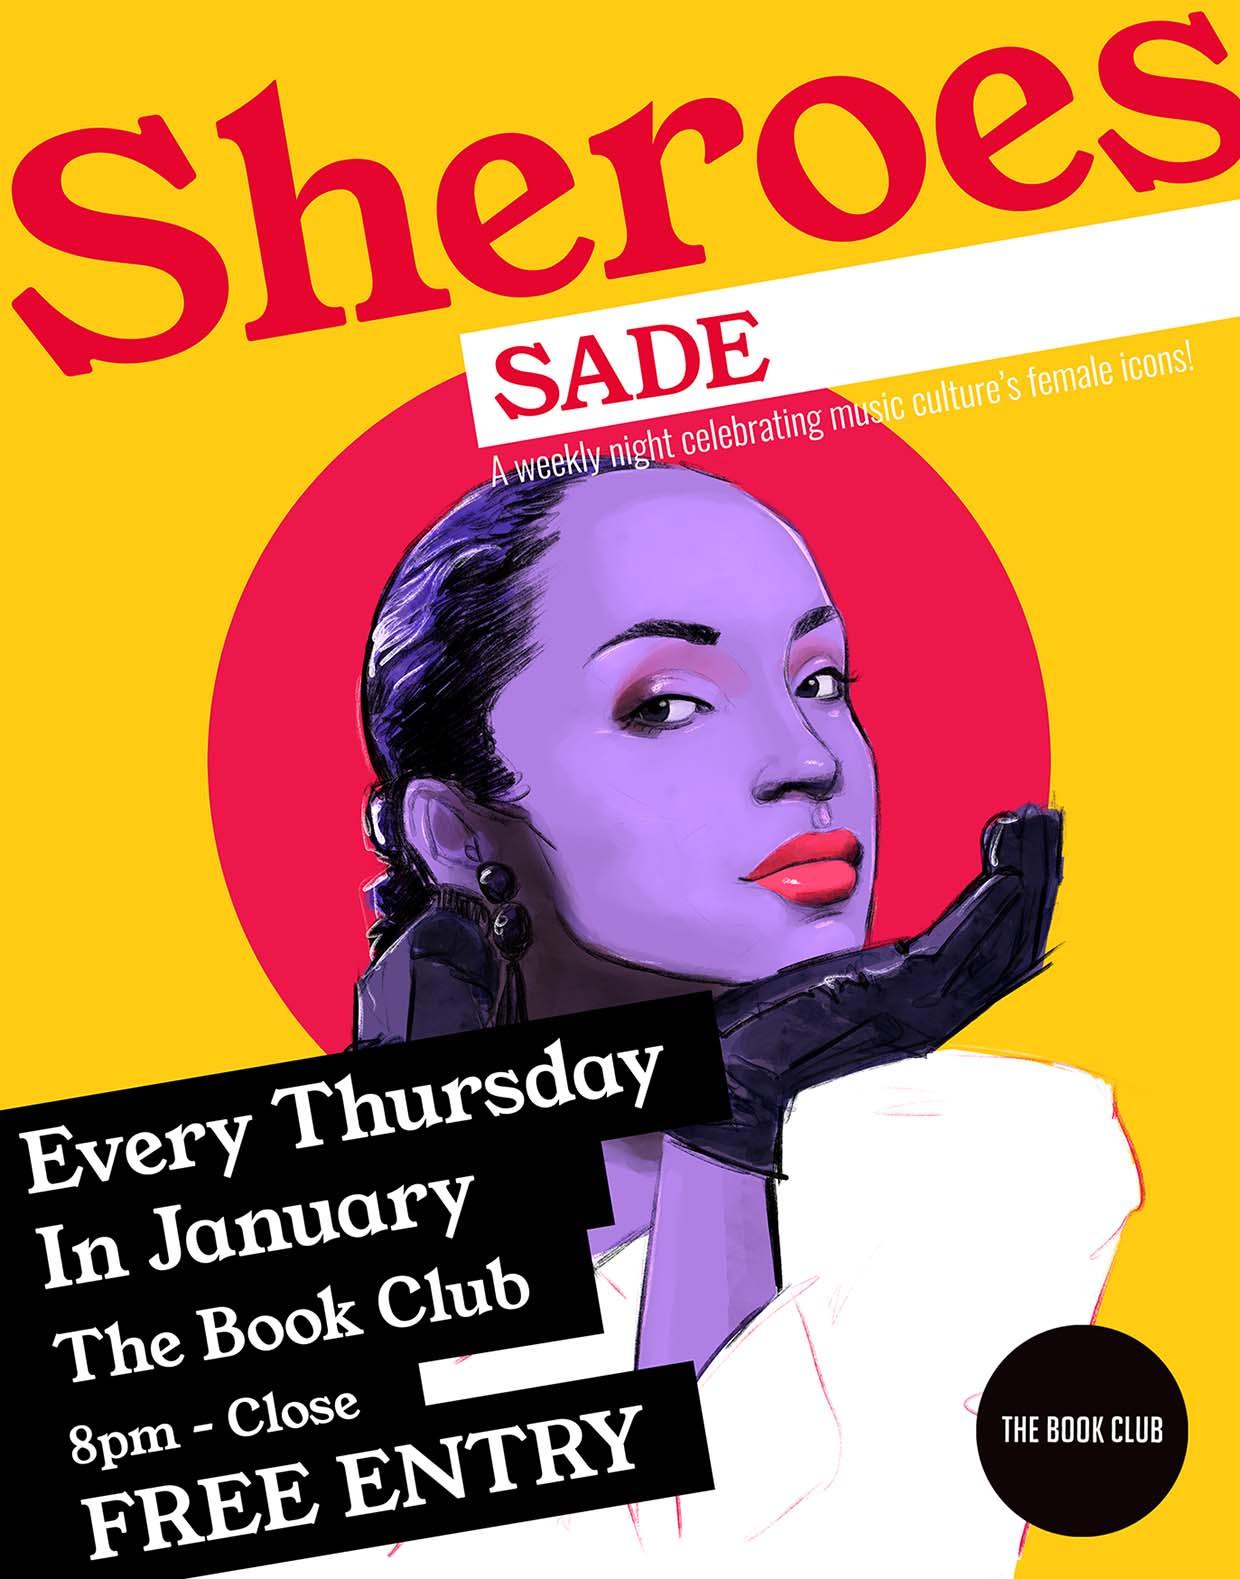 Sheroes: Sade - Every Thursday In Janaury